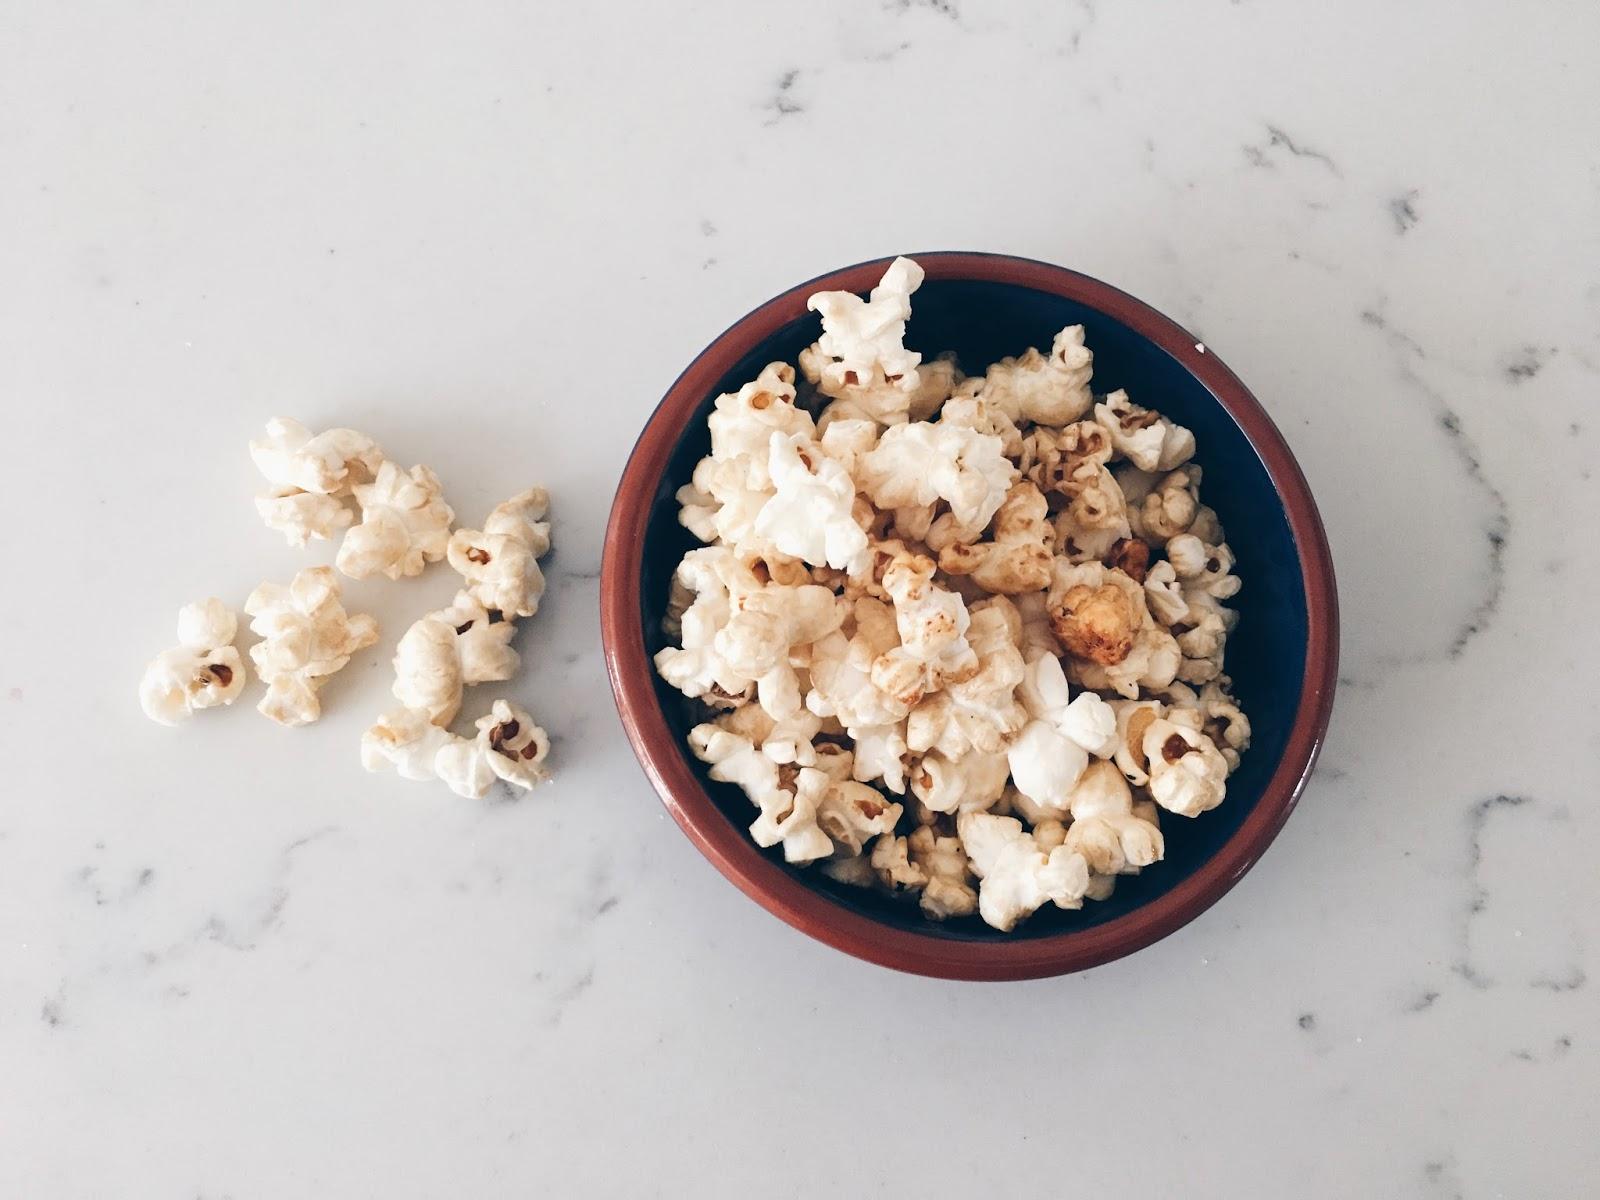 Popcorn - Top 5 healthy snack ideas for 2017